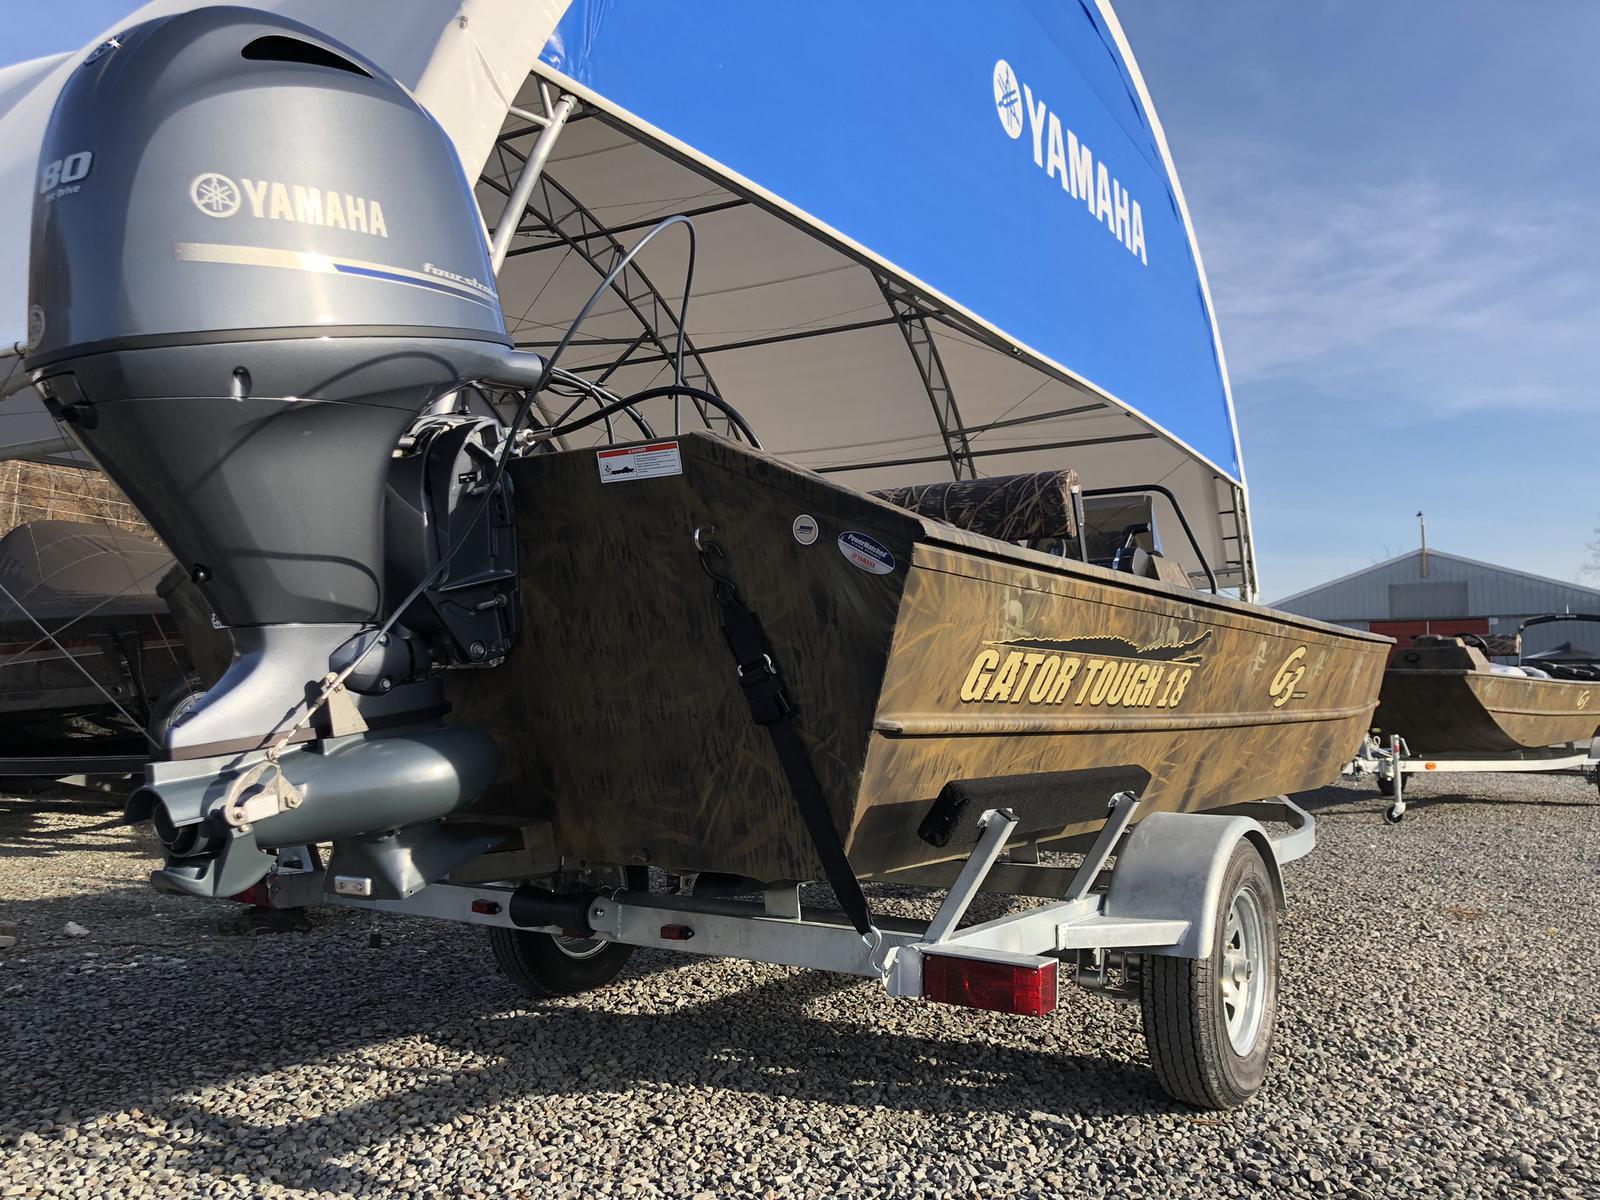 G3 Gator Tough 18 CCJ (Jet Tunnel Hull)